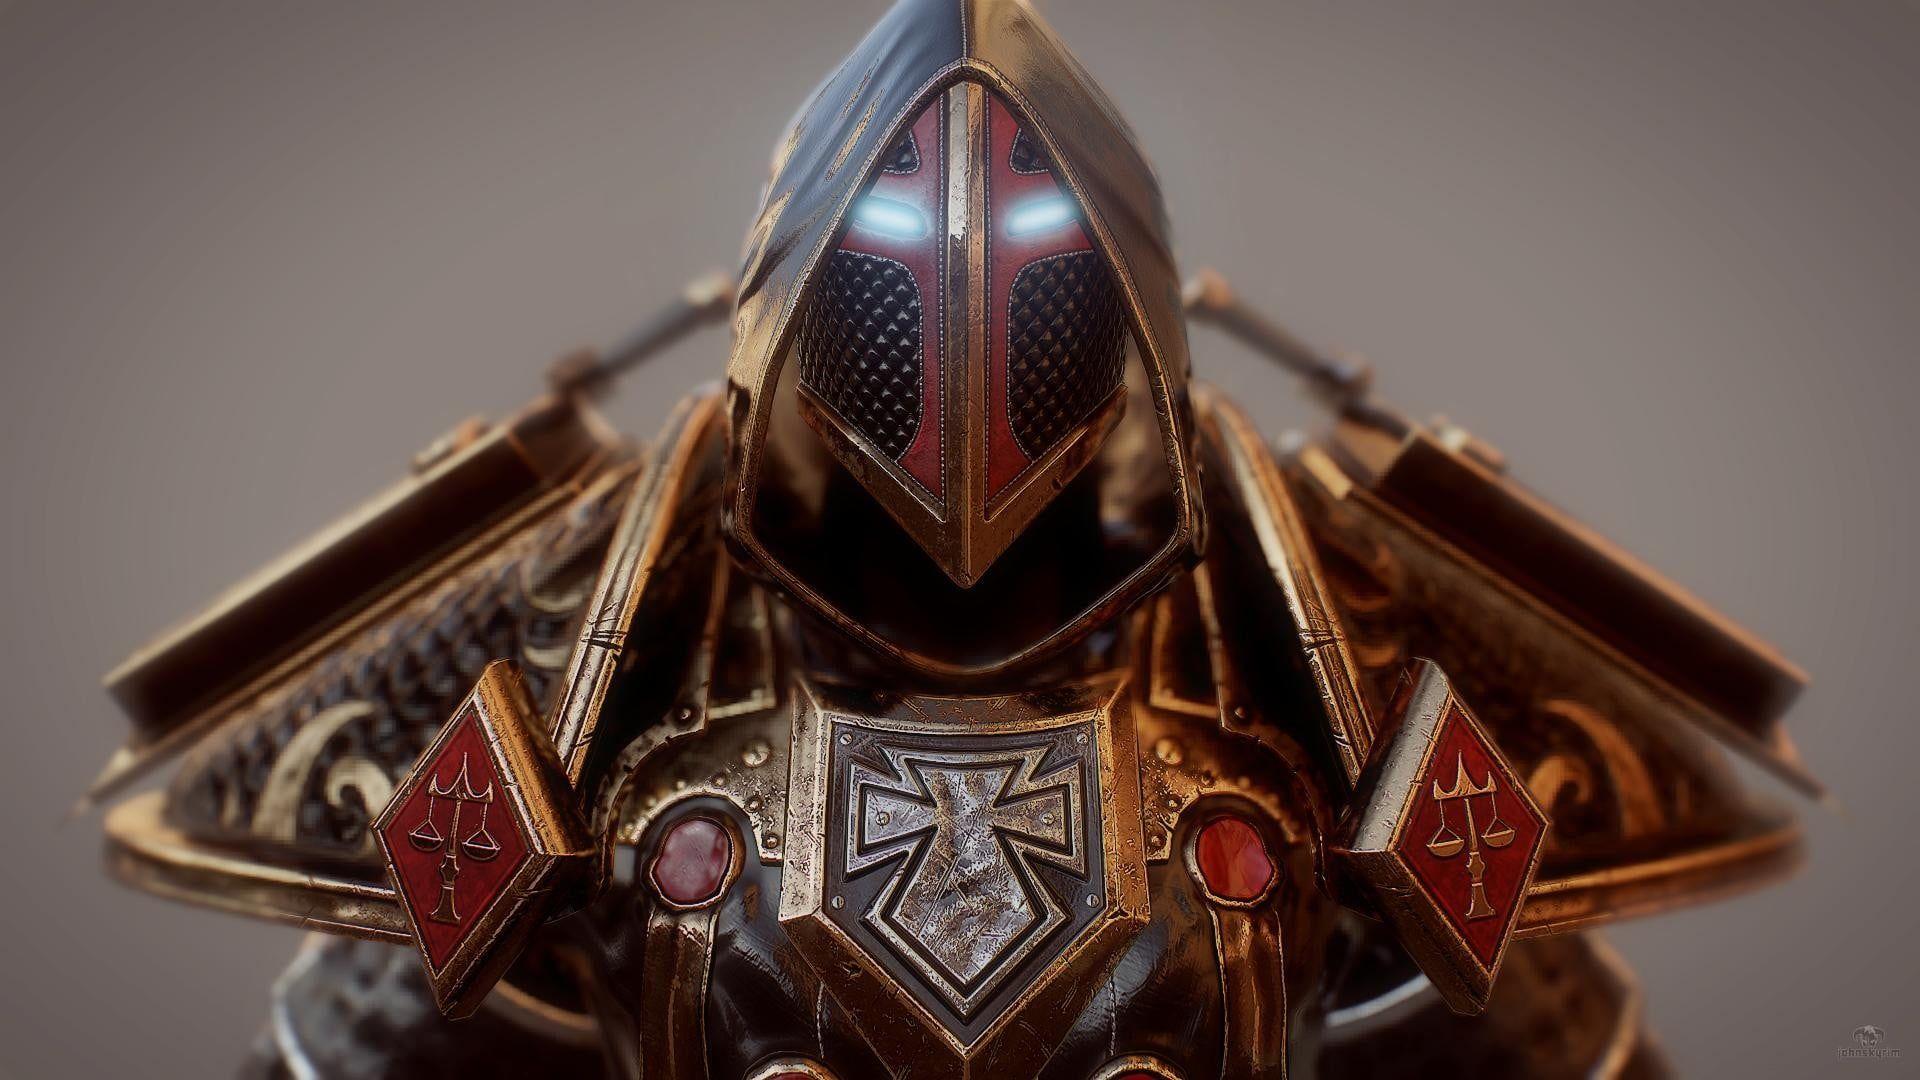 Gold Armored Knight Wallpaper World Of Warcraft Paladin Video Games 1080p Wallpaper Hdwallpaper Desktop Paladin World Of Warcraft Warcraft